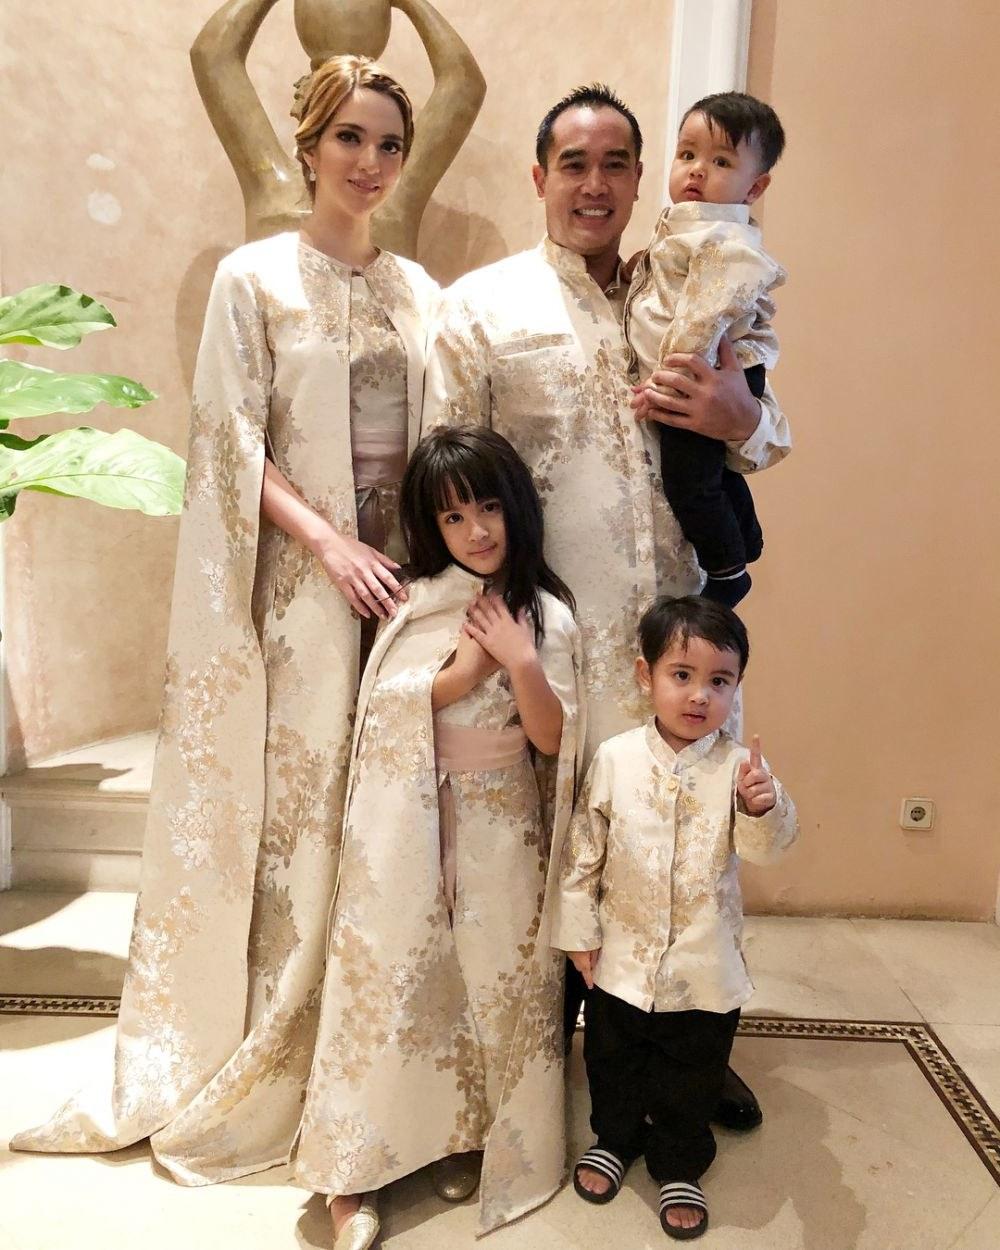 Inspirasi Model Baju Lebaran Keluarga J7do Potret 16 Seleb Pakai Baju Kembaran Saat Lebaran Kompak Abis